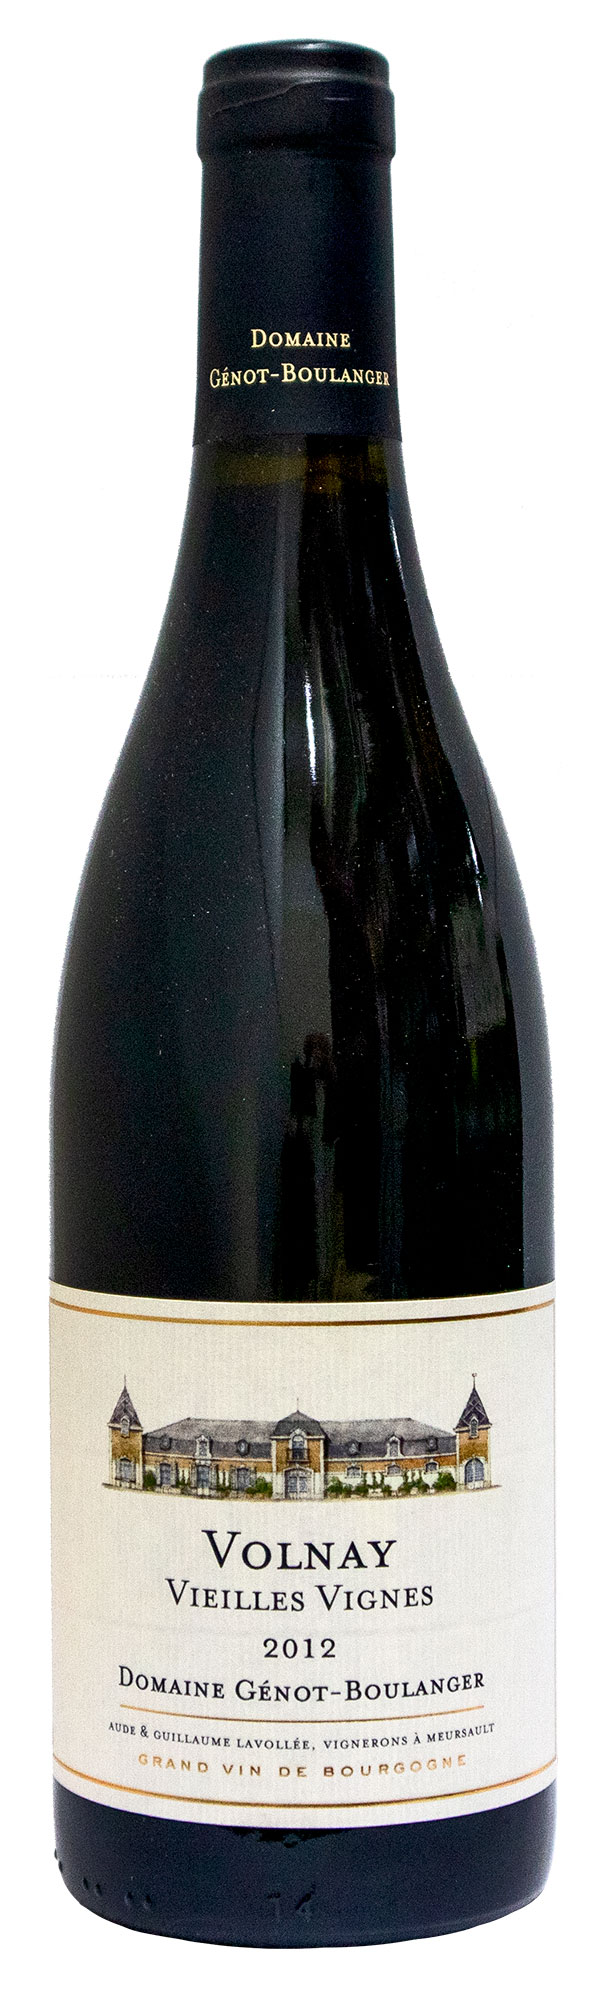 Domaine Génot-Boulanger Volnay Vieilles Vignes